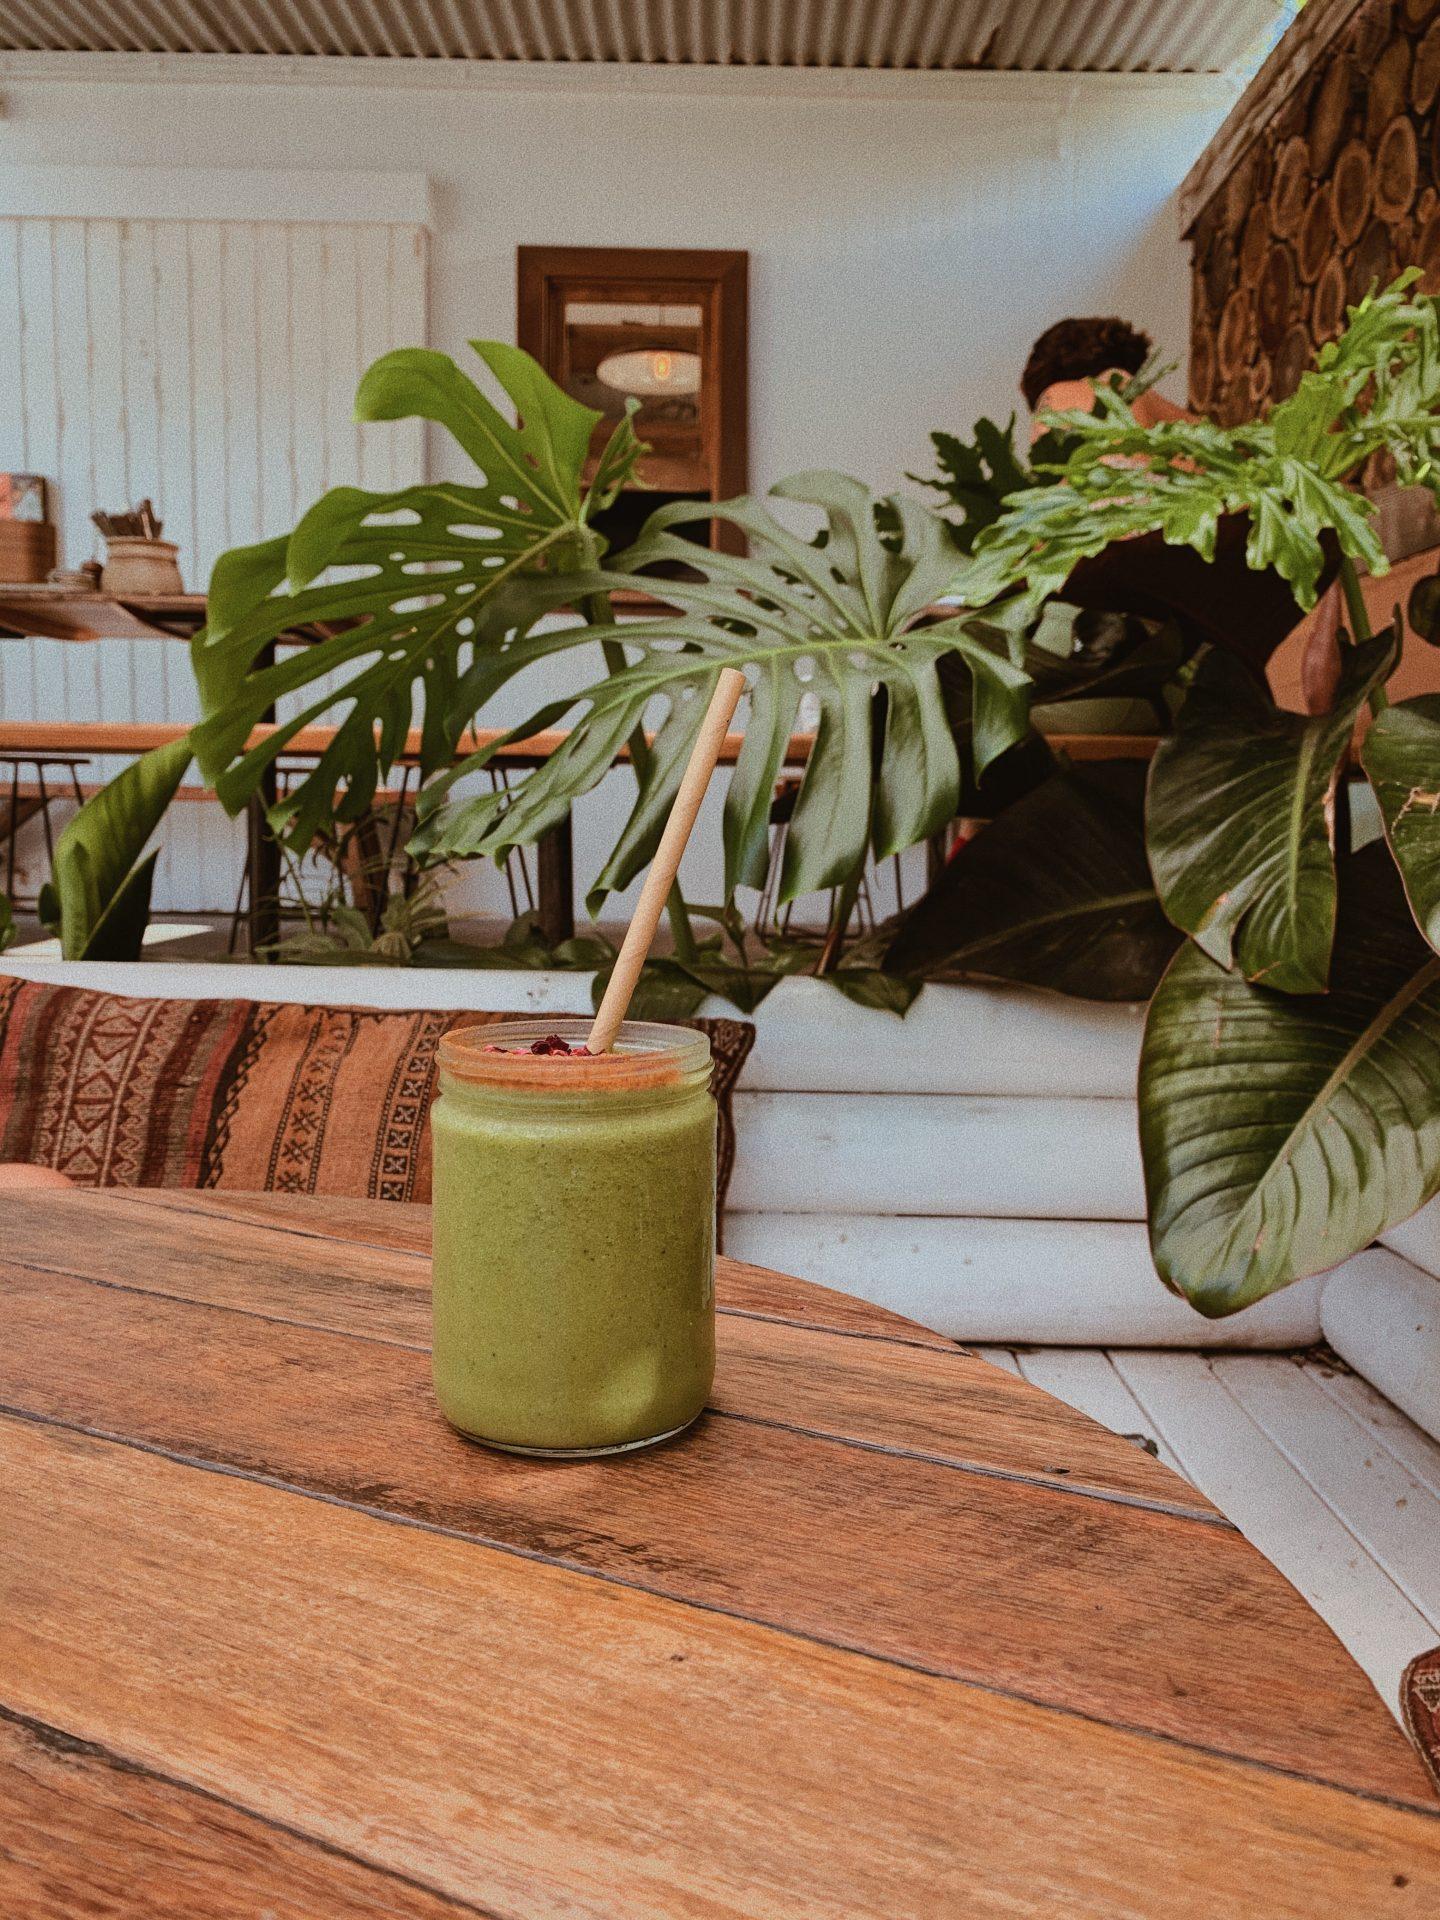 a green juice in a tropical surrounding, vegan and vegetarian restaurants, travel tips for vegans